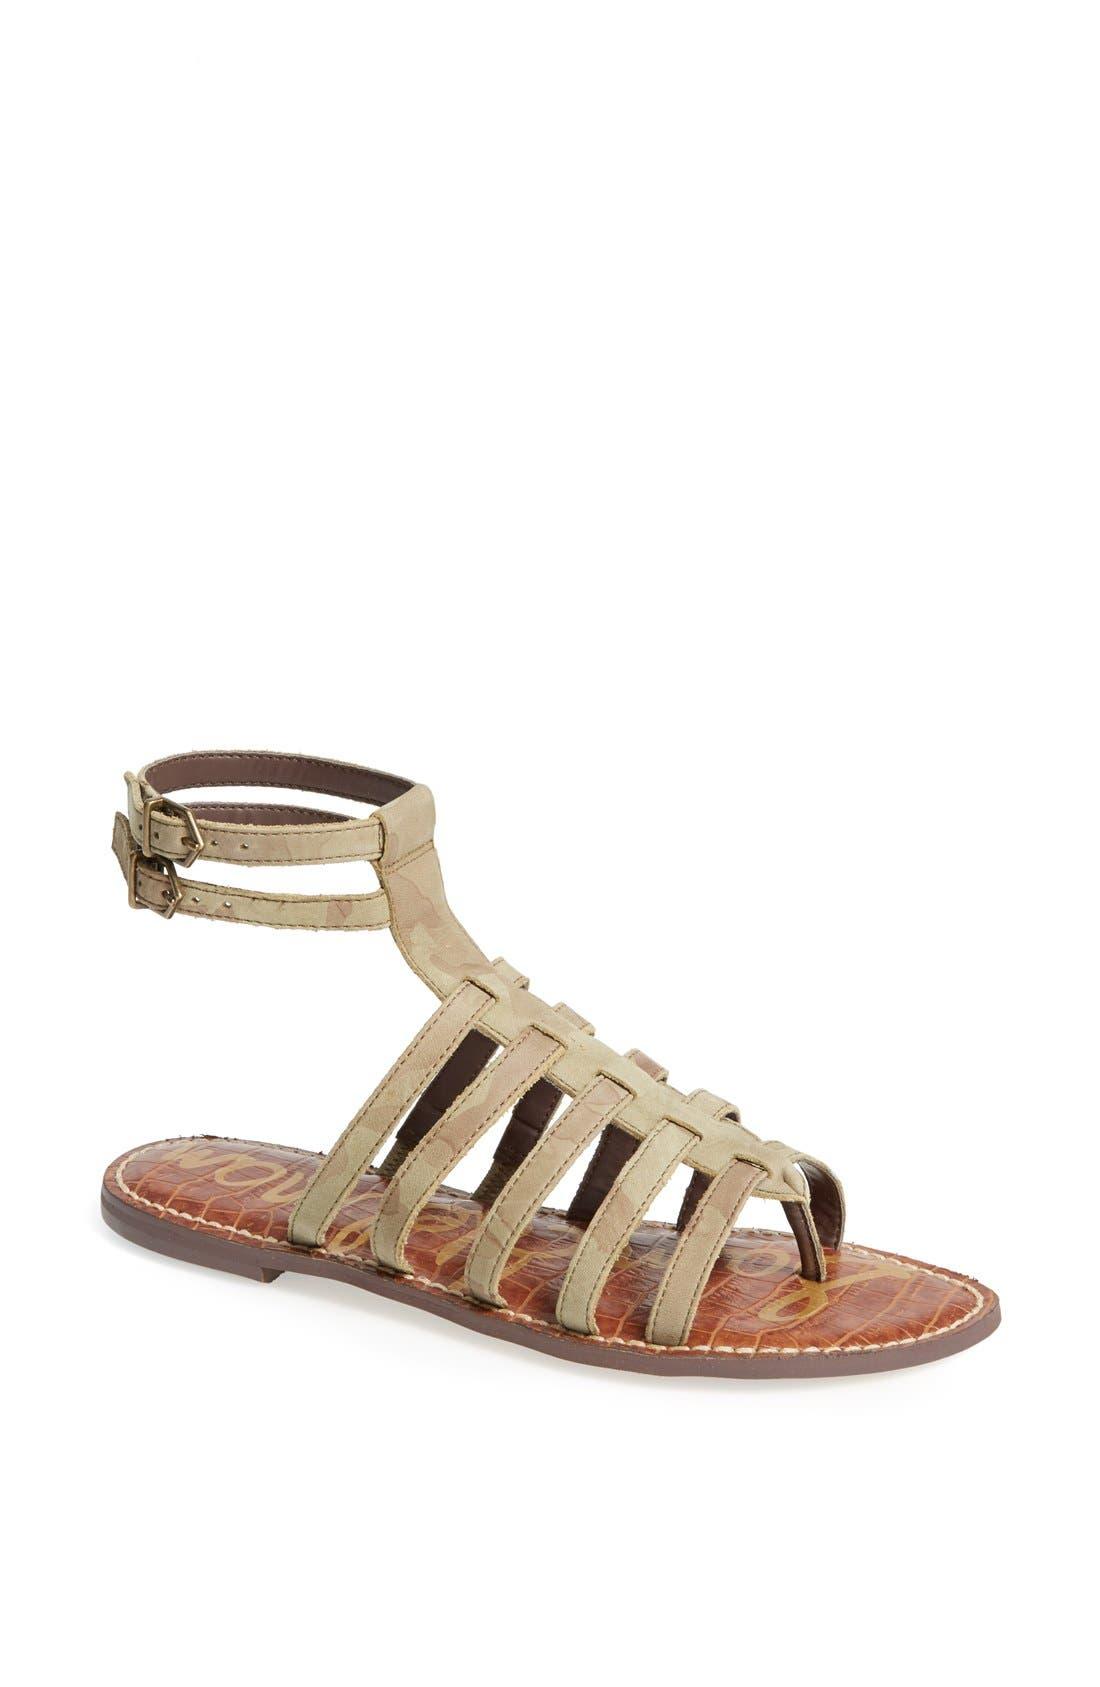 Main Image - Sam Edelman 'Gilda' Gladiator Sandal